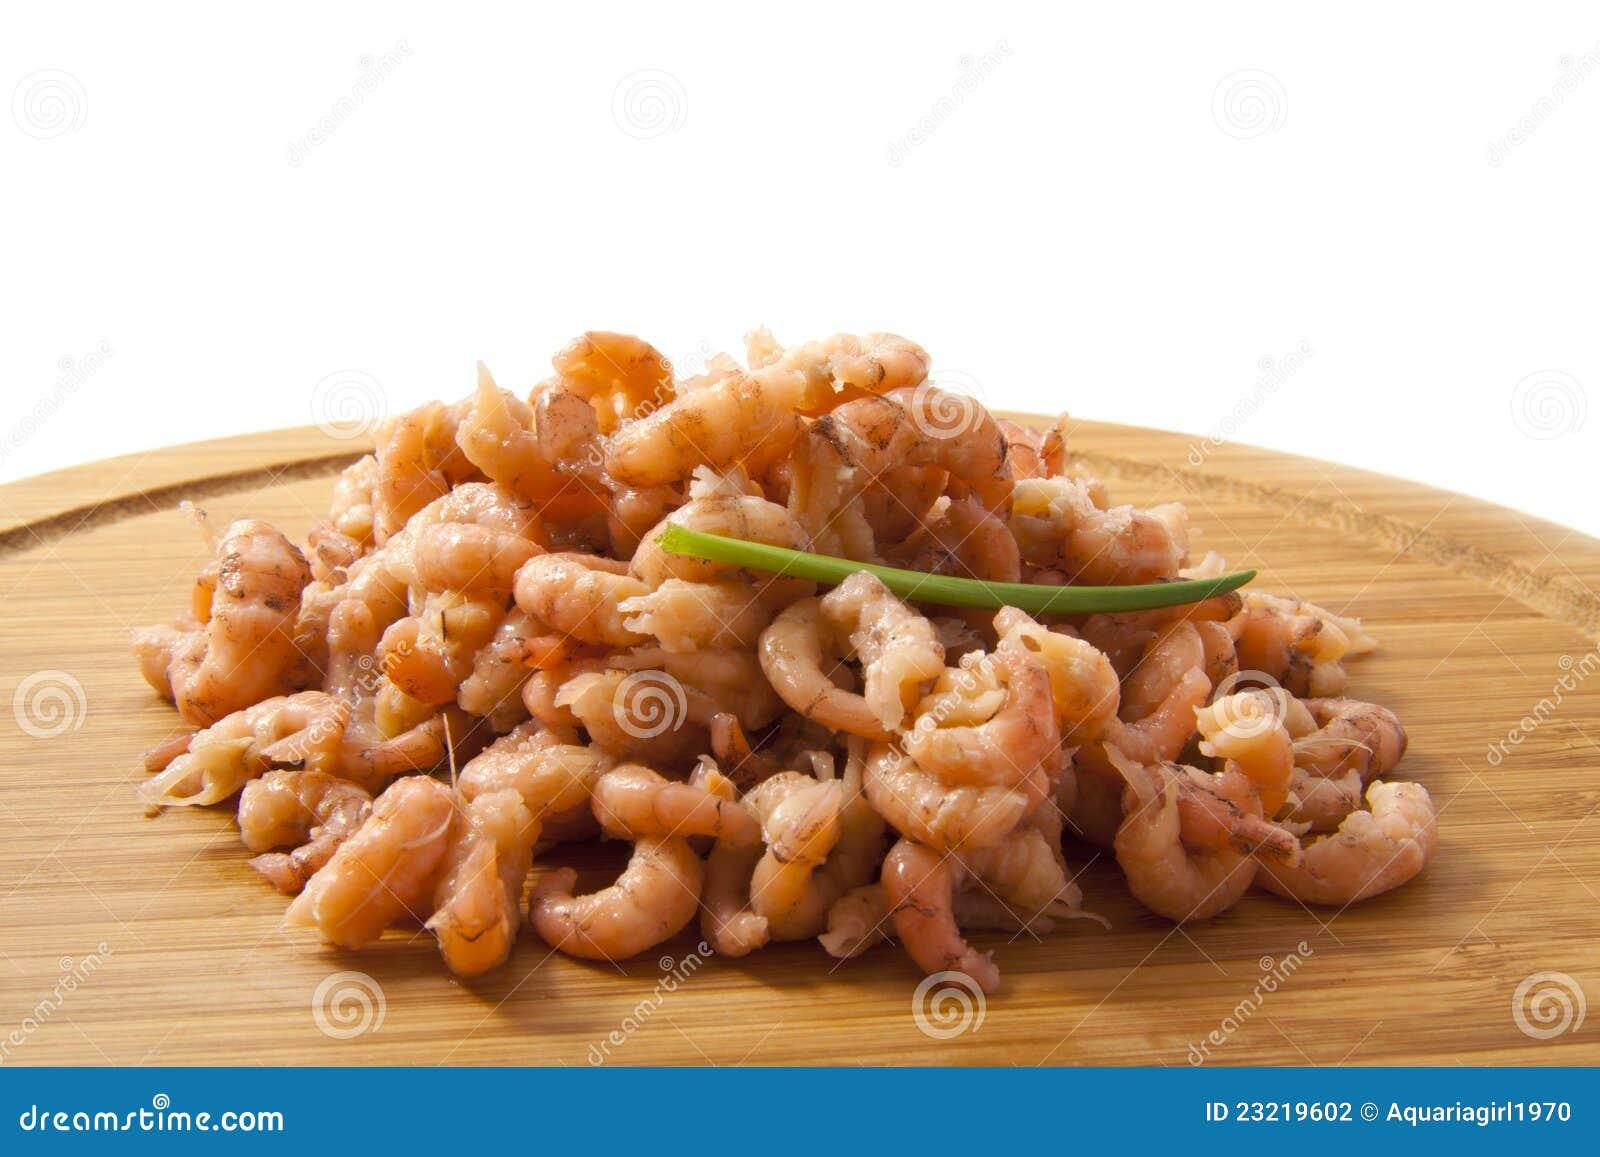 Dutch Shrimp Stock Photography - Image: 23219602